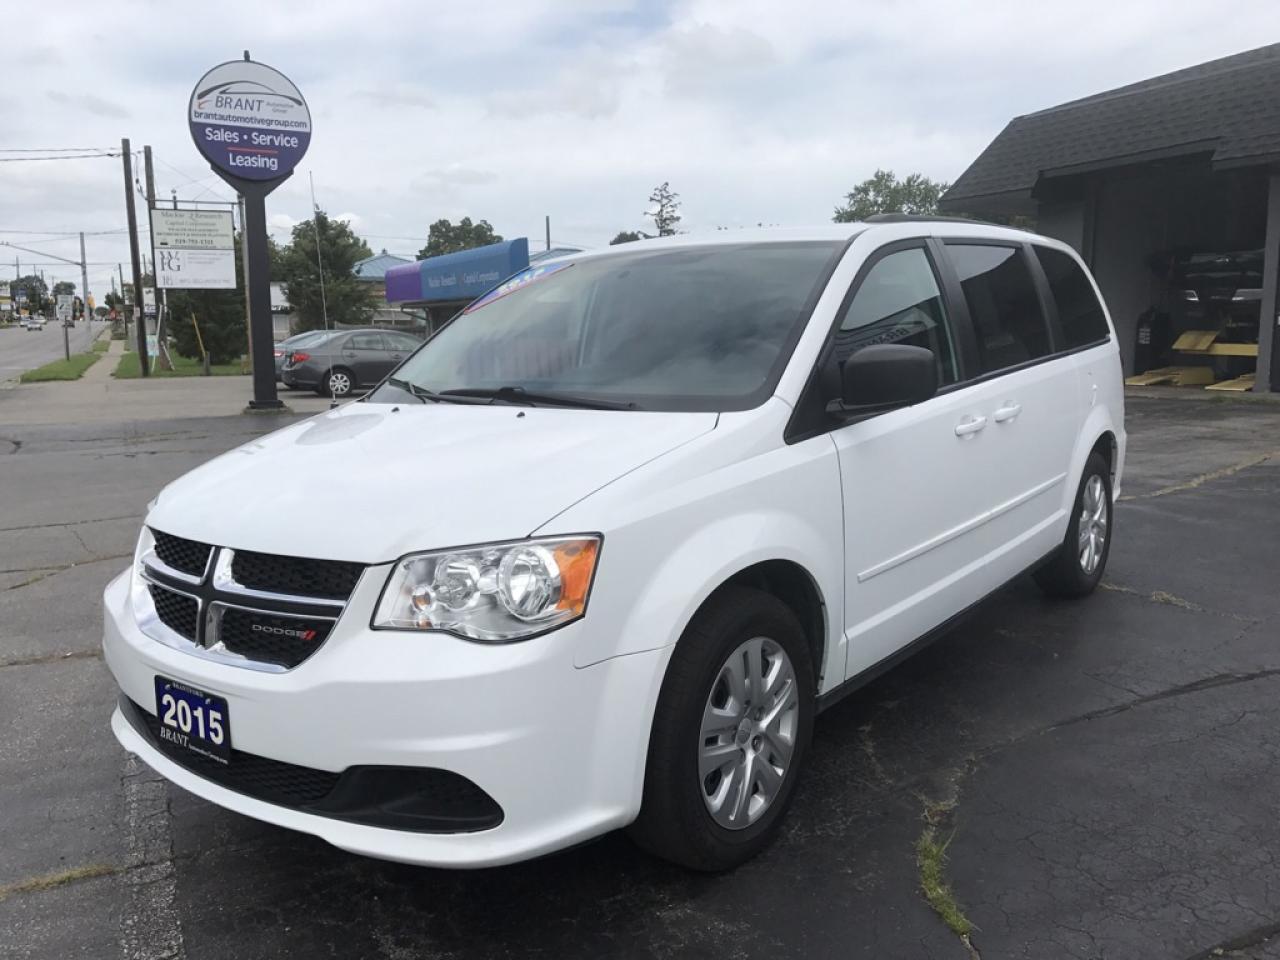 Photo of White 2015 Dodge Grand Caravan